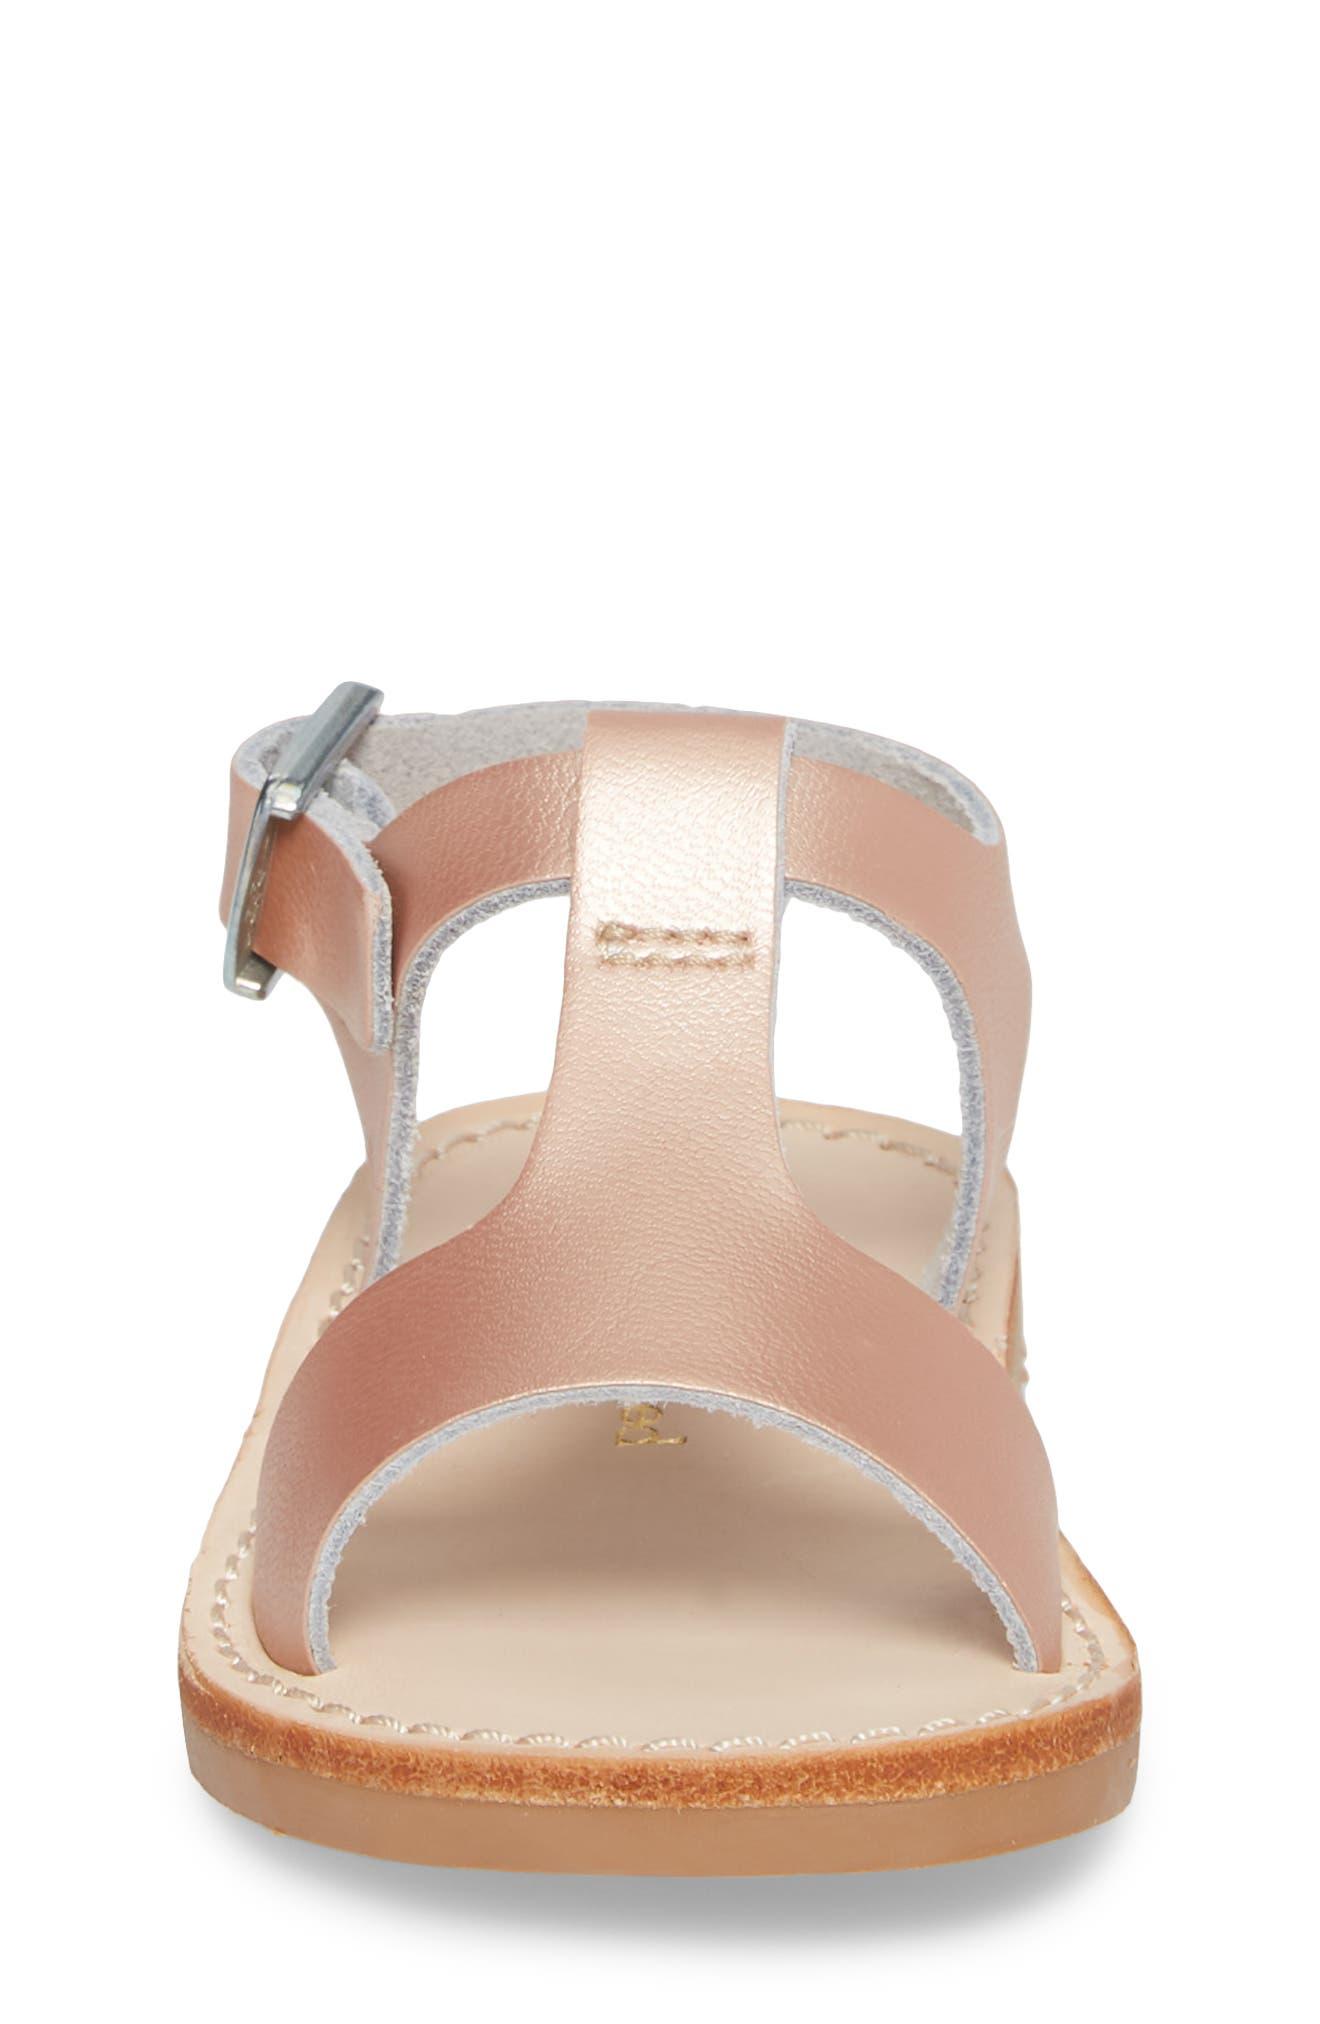 Malibu Water Resistant Sandal,                             Alternate thumbnail 4, color,                             ROSE GOLD